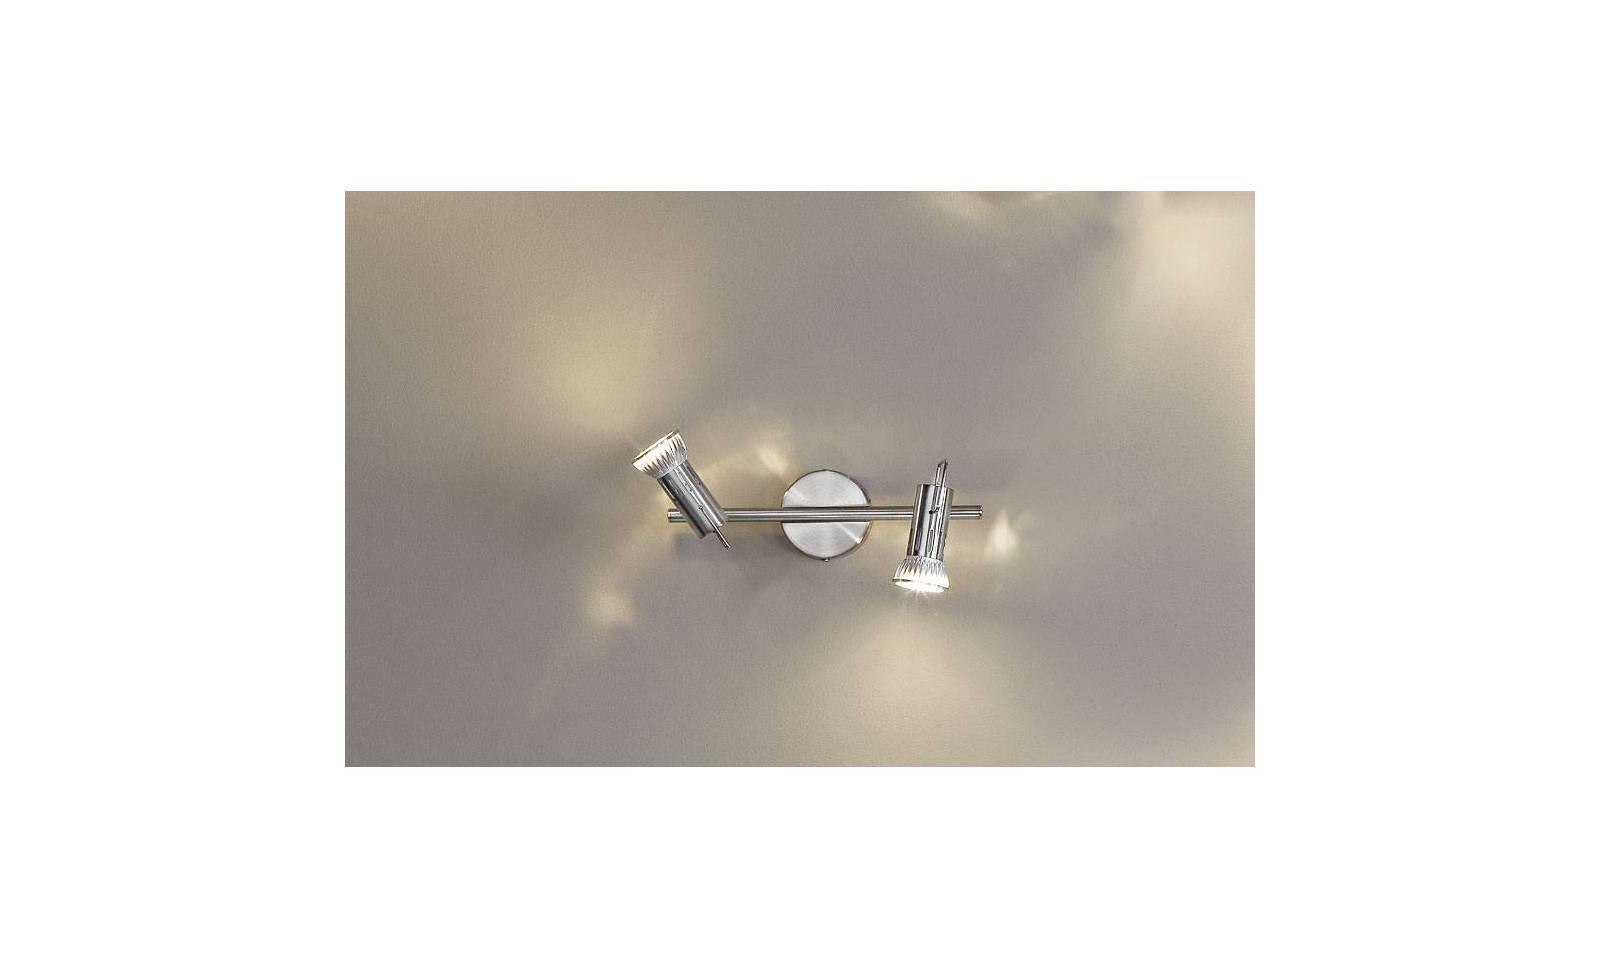 Plafoniere Slim Led Caldak : Faretti led interesting ceiling light rotatable i spotlight